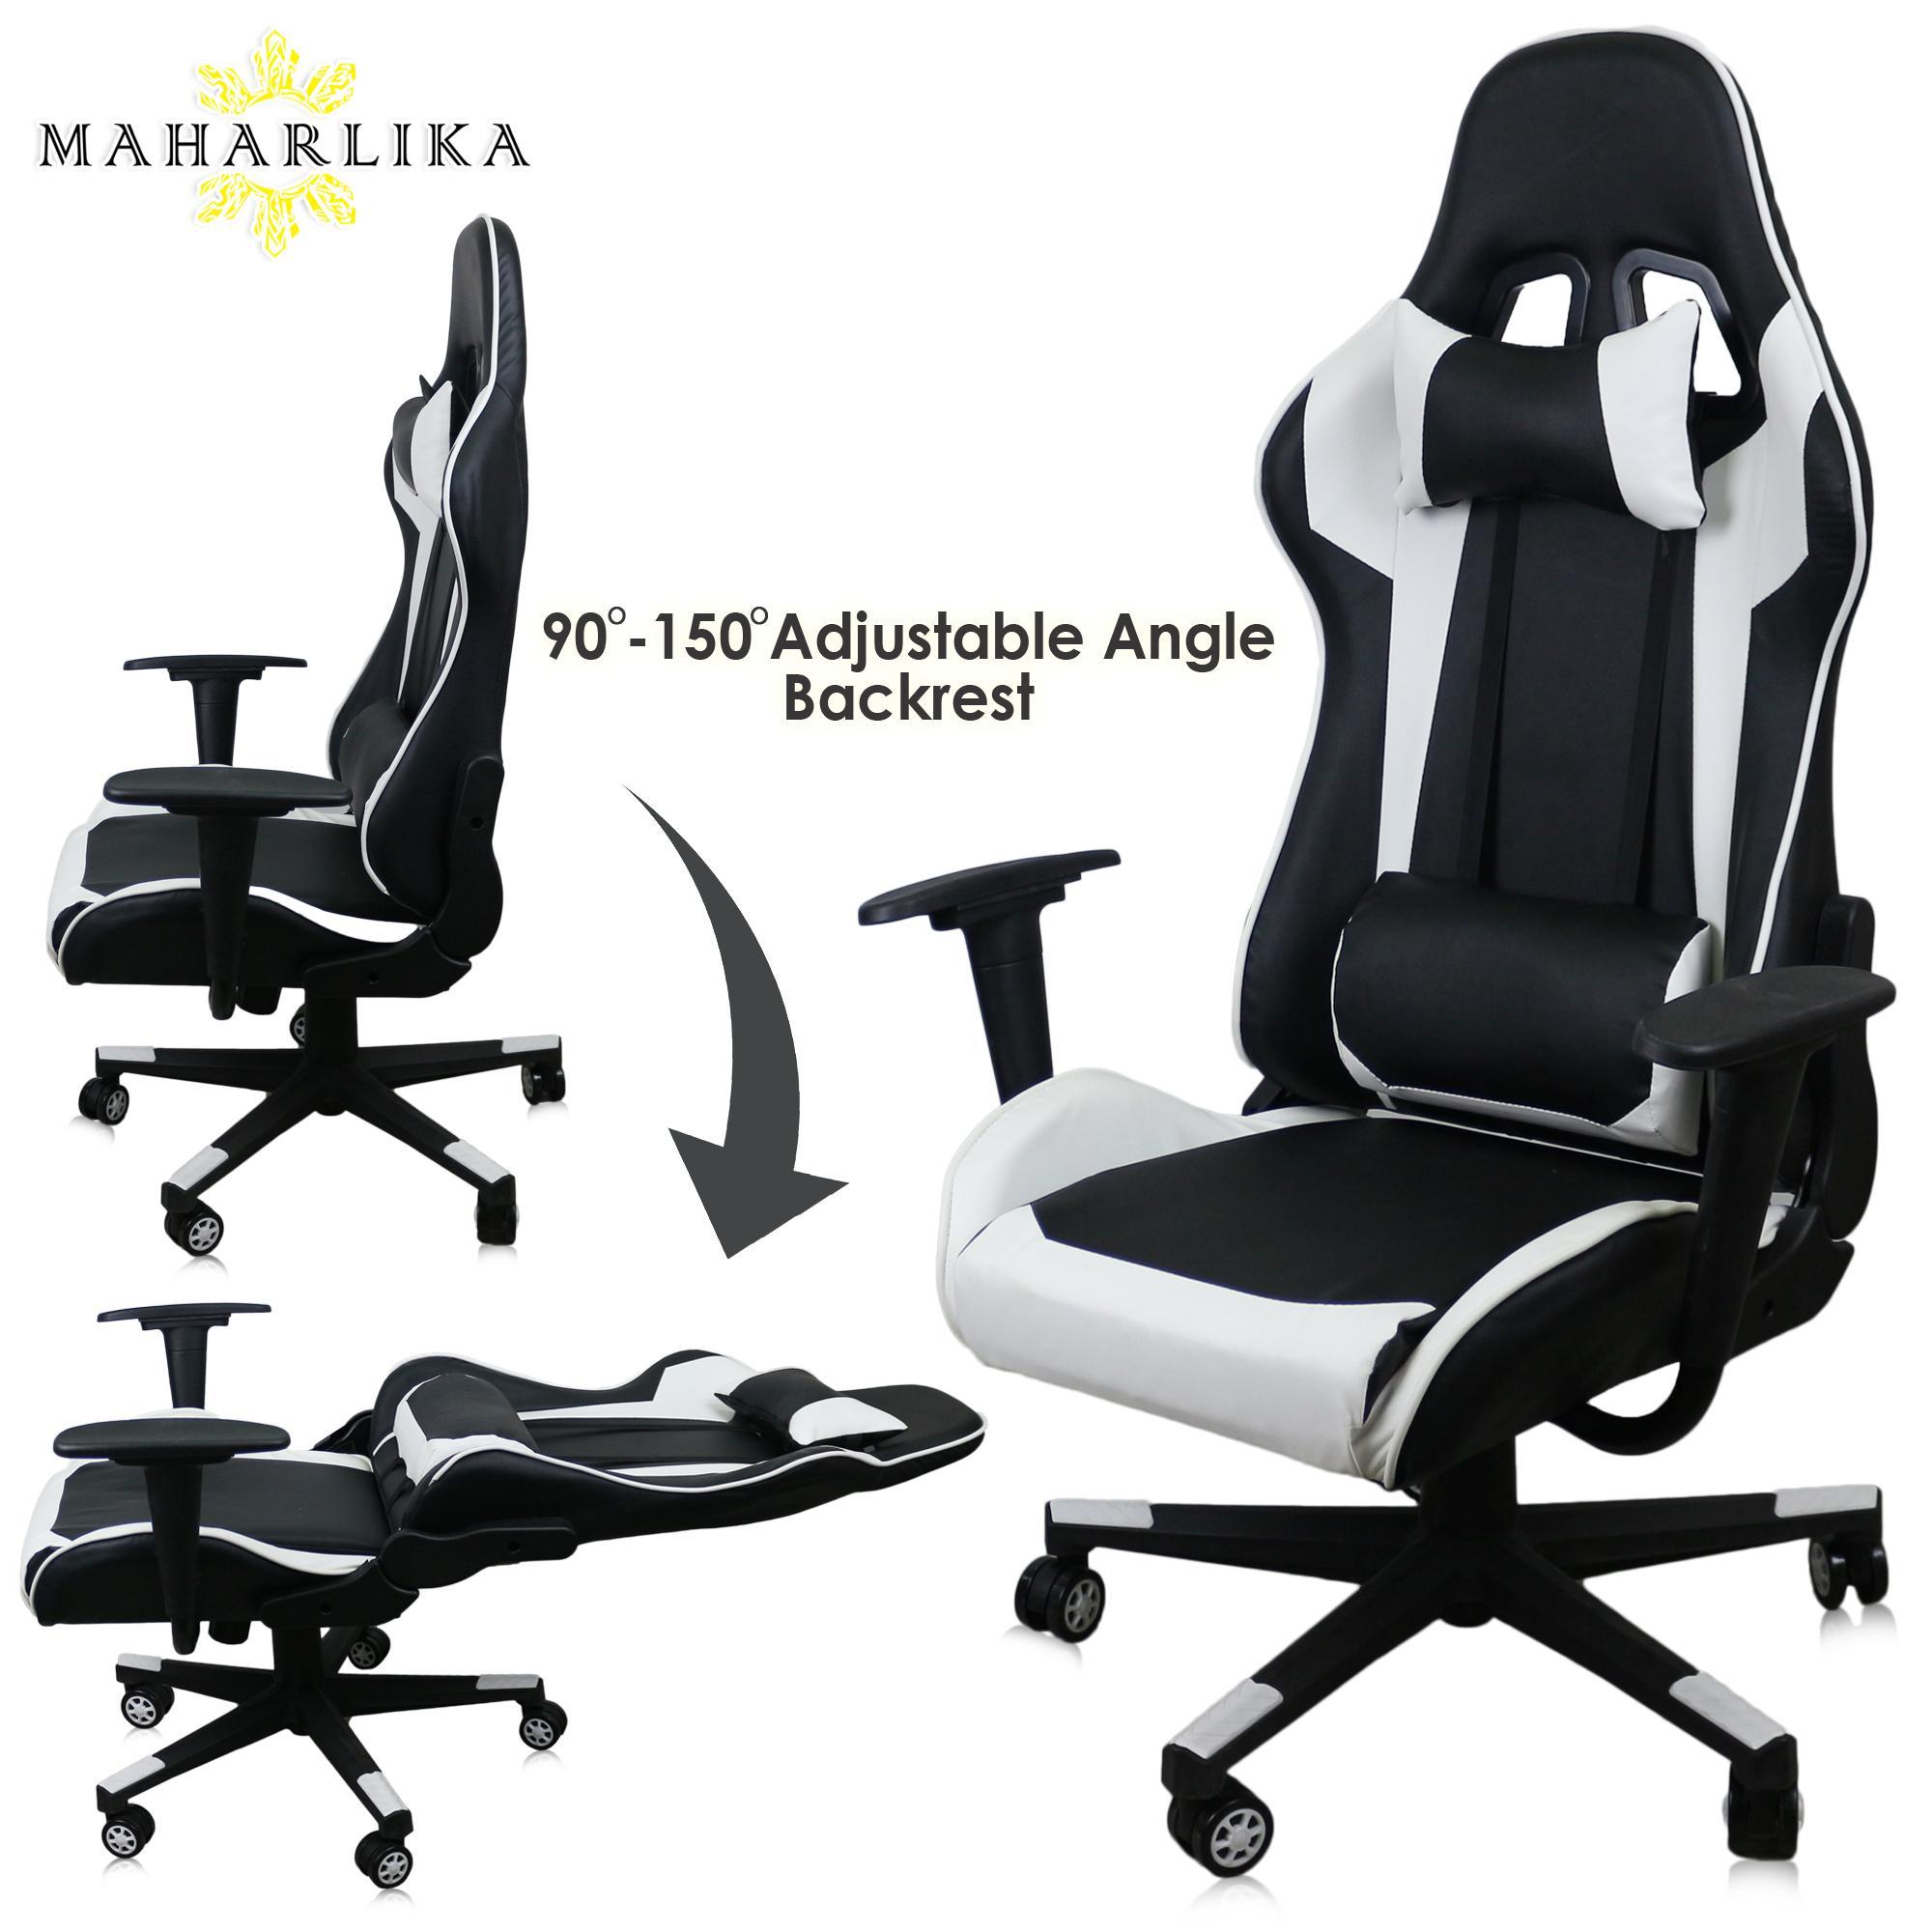 Buy Maharlika Home Office Chairs Online Lazada Com Ph